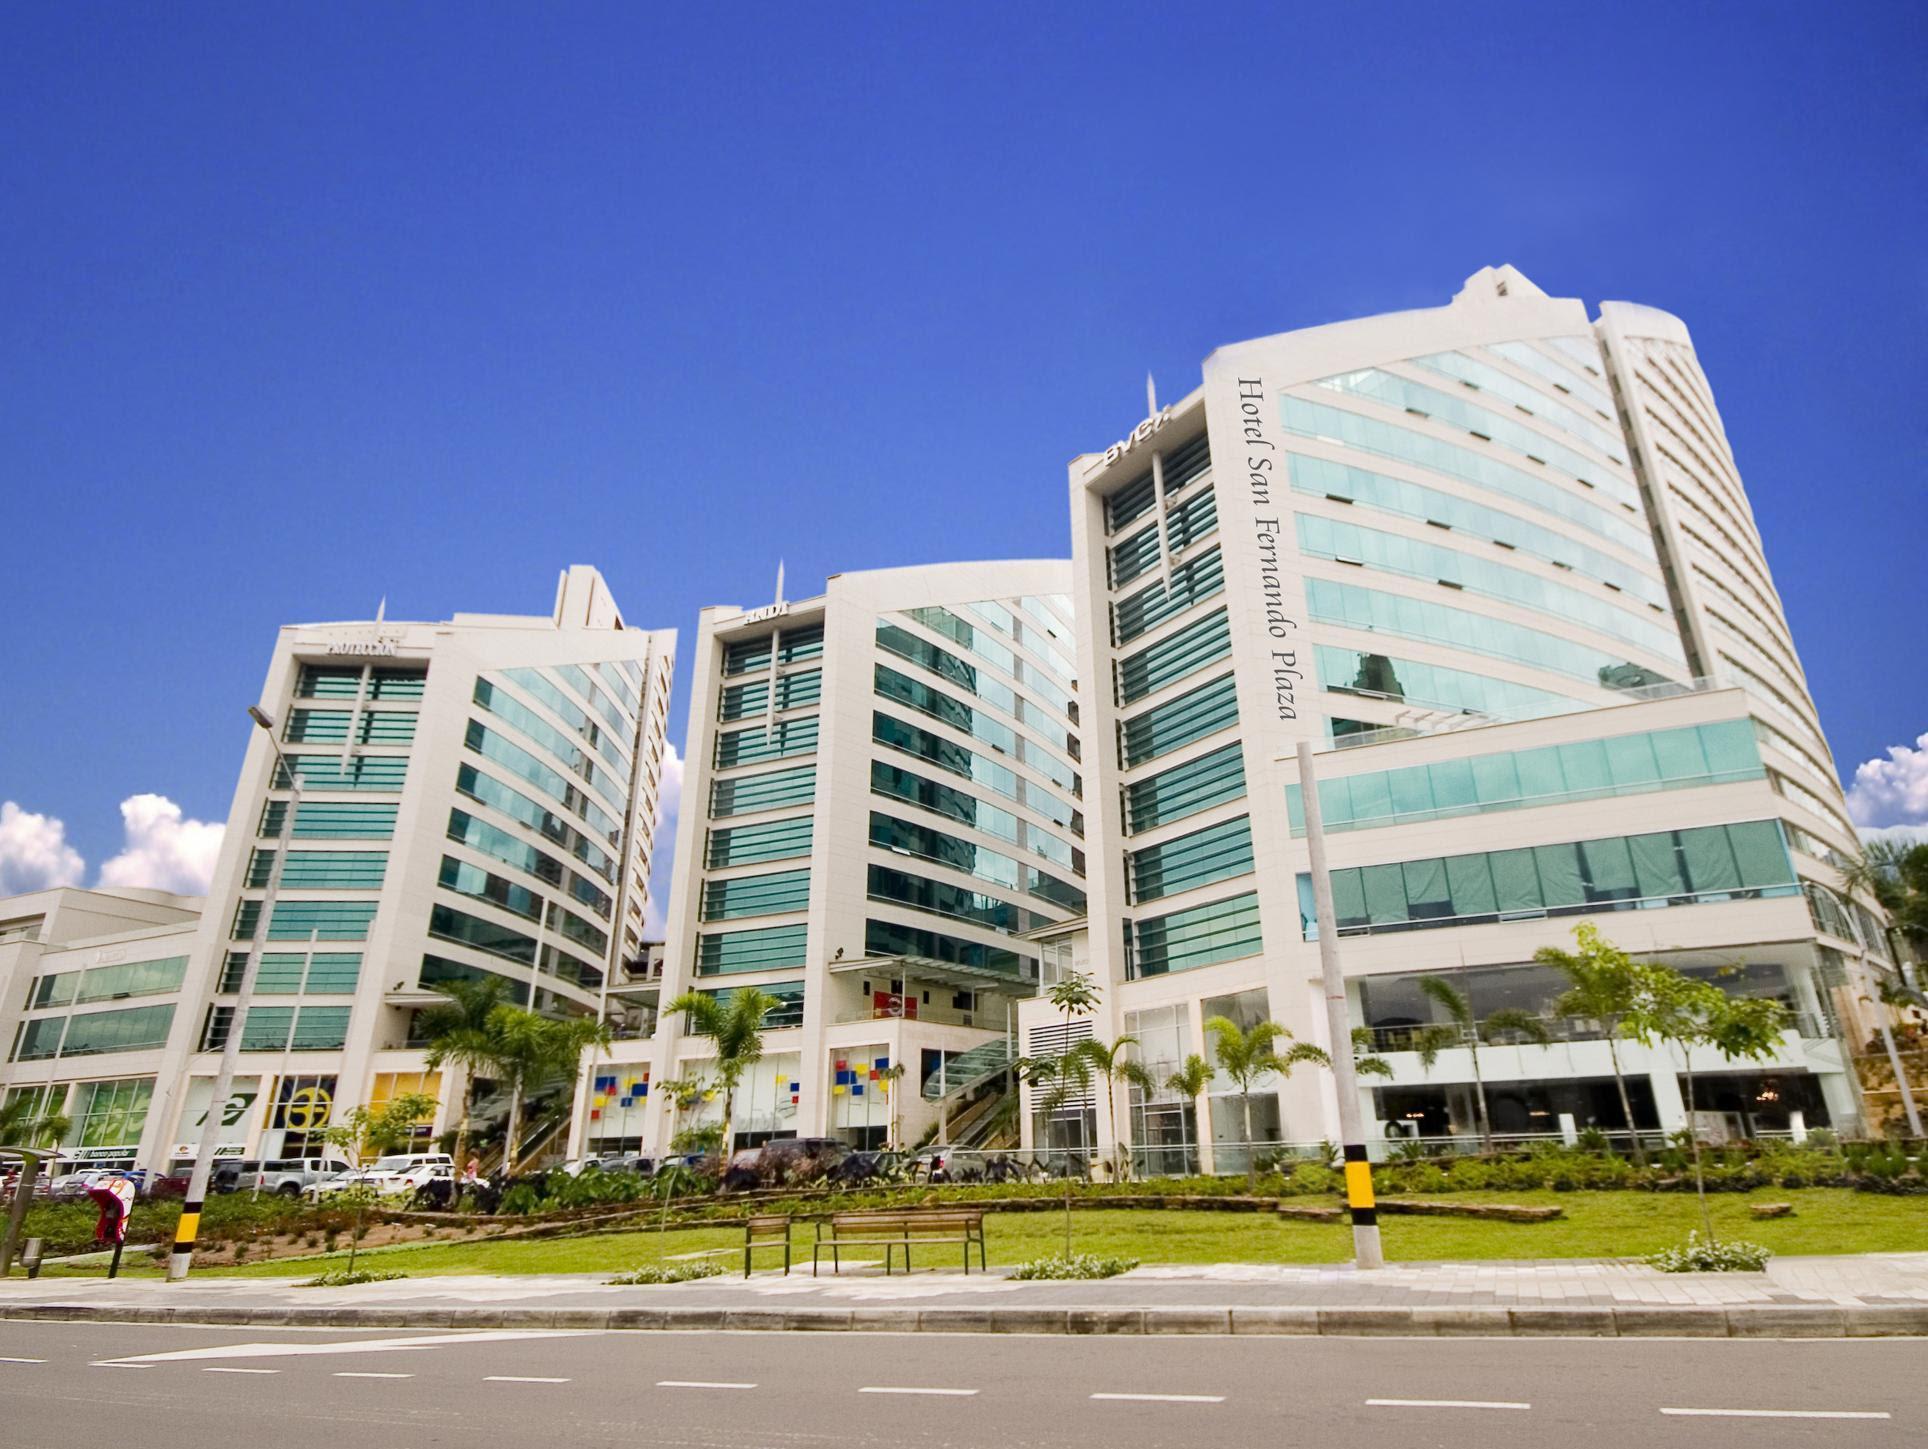 Hotel San Fernando Plaza Reviews